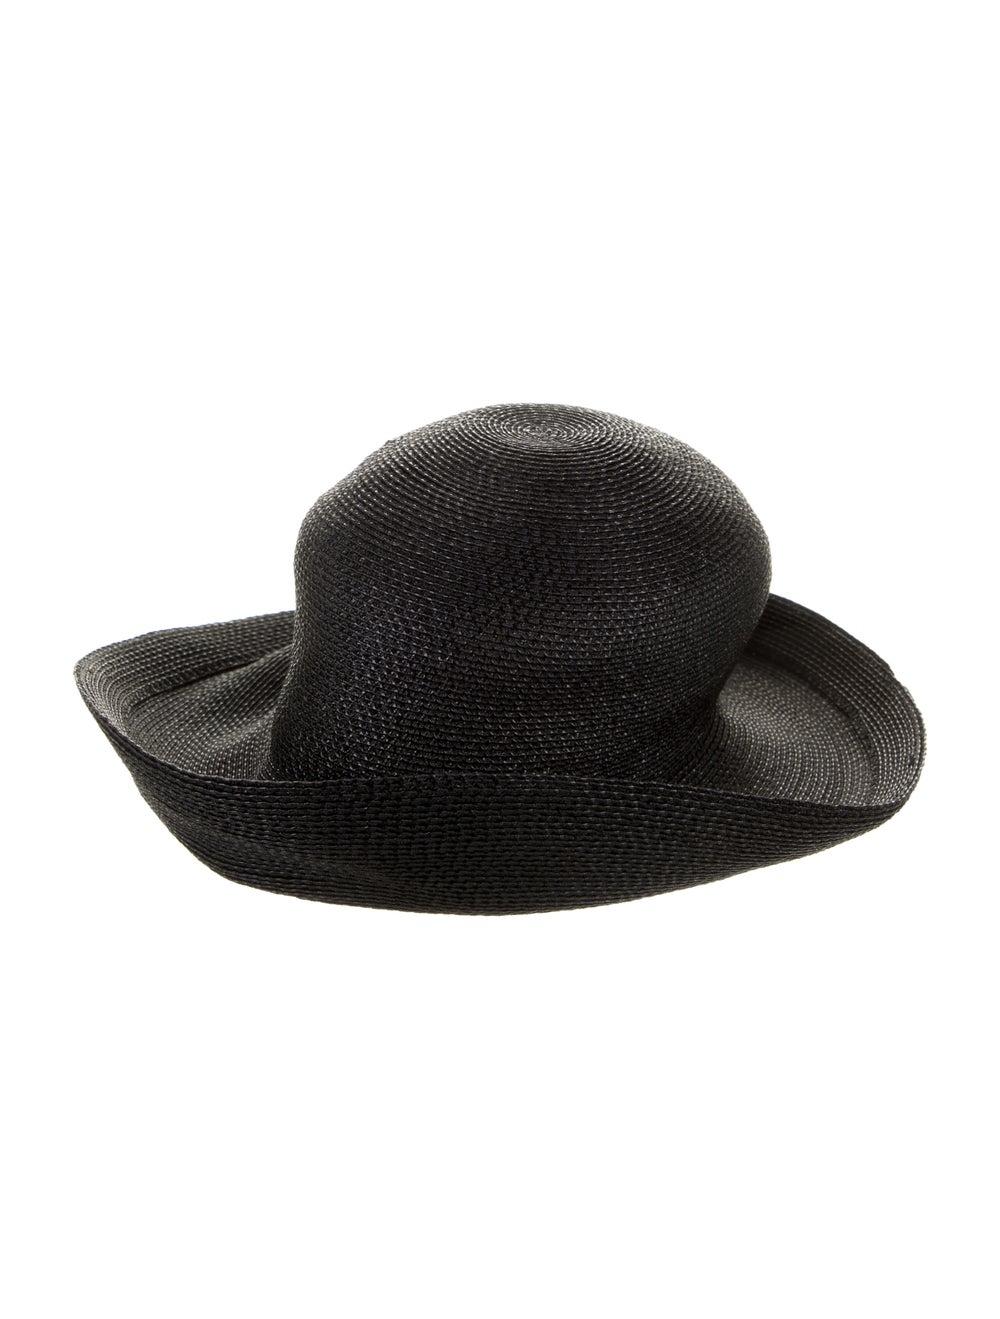 Patricia Underwood Black Straw Sun Hat Black - image 1